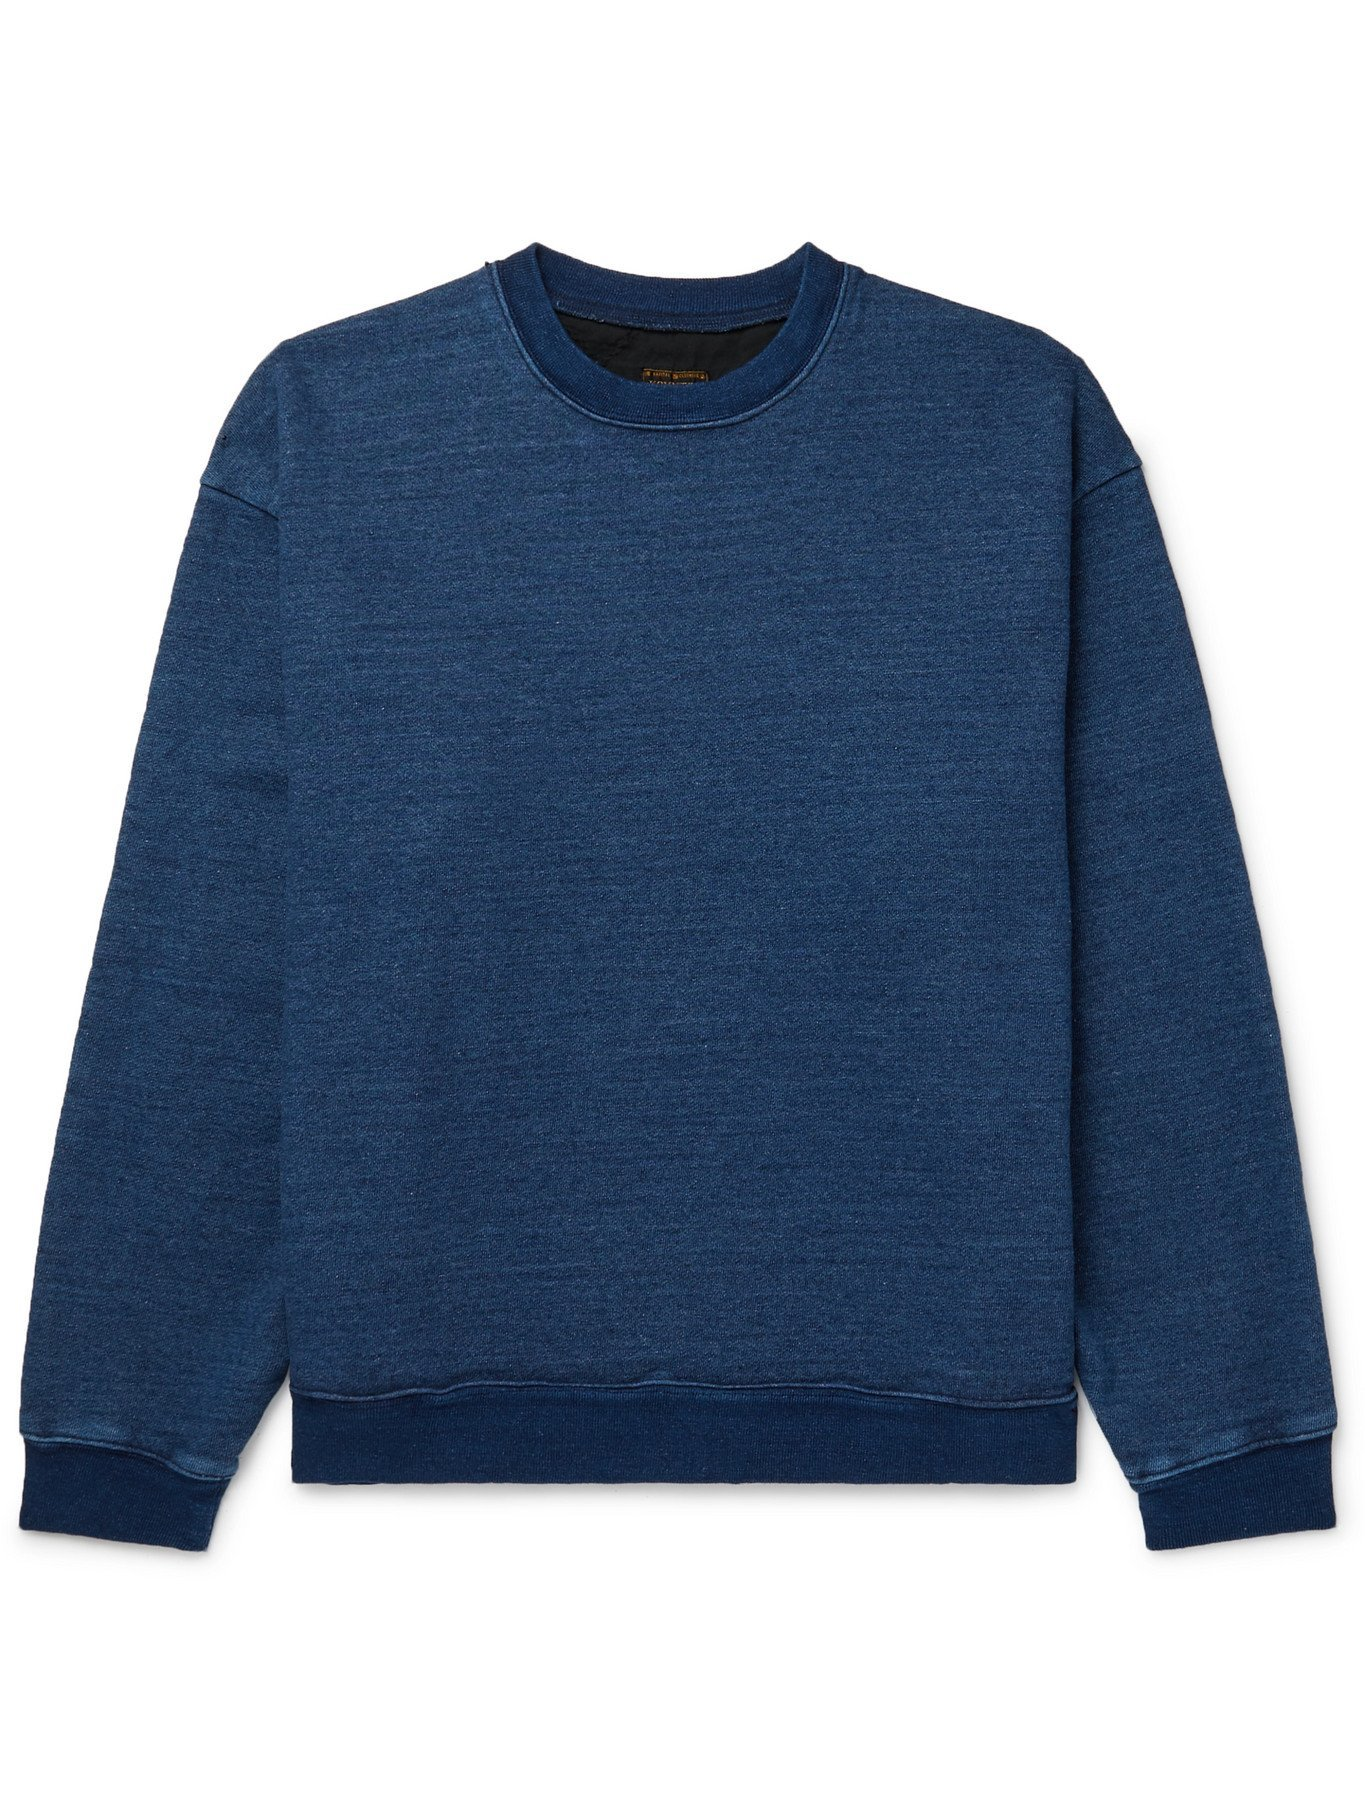 KAPITAL - Patchwork-Panelled Cotton-Jersey Sweatshirt - Blue